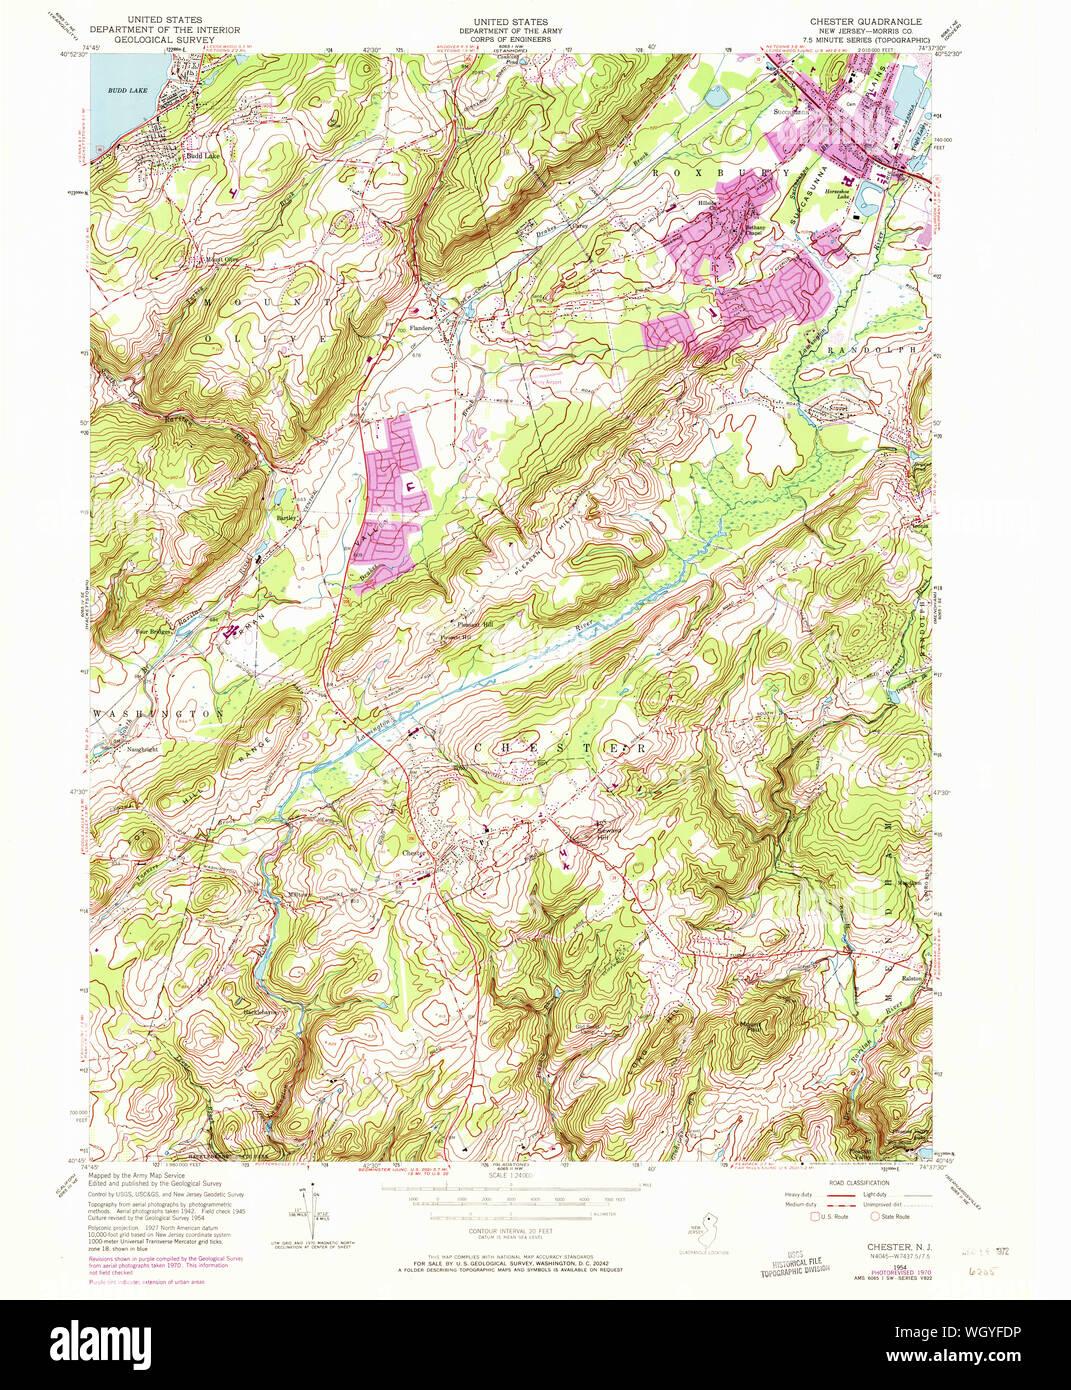 USGS TOPO Map New Jersey NJ Chester 254288 1954 24000 ... Map Chester Nj on washington township, south bound brook nj map, collegeville nj map, bethlehem township nj map, richmond nj map, blue anchor nj map, earl nj map, mountain lakes, jim breuer, evesham township nj map, greenwich township nj map, glasgow nj map, harrisburg nj map, cranberry township nj map, nyack nj map, long valley, hampton nj map, victory gardens, collings lakes nj map, pittsburgh nj map, holden nj map, delaware river nj map, delran township nj map, mount olive, morris county, lincoln park, great falls nj map,